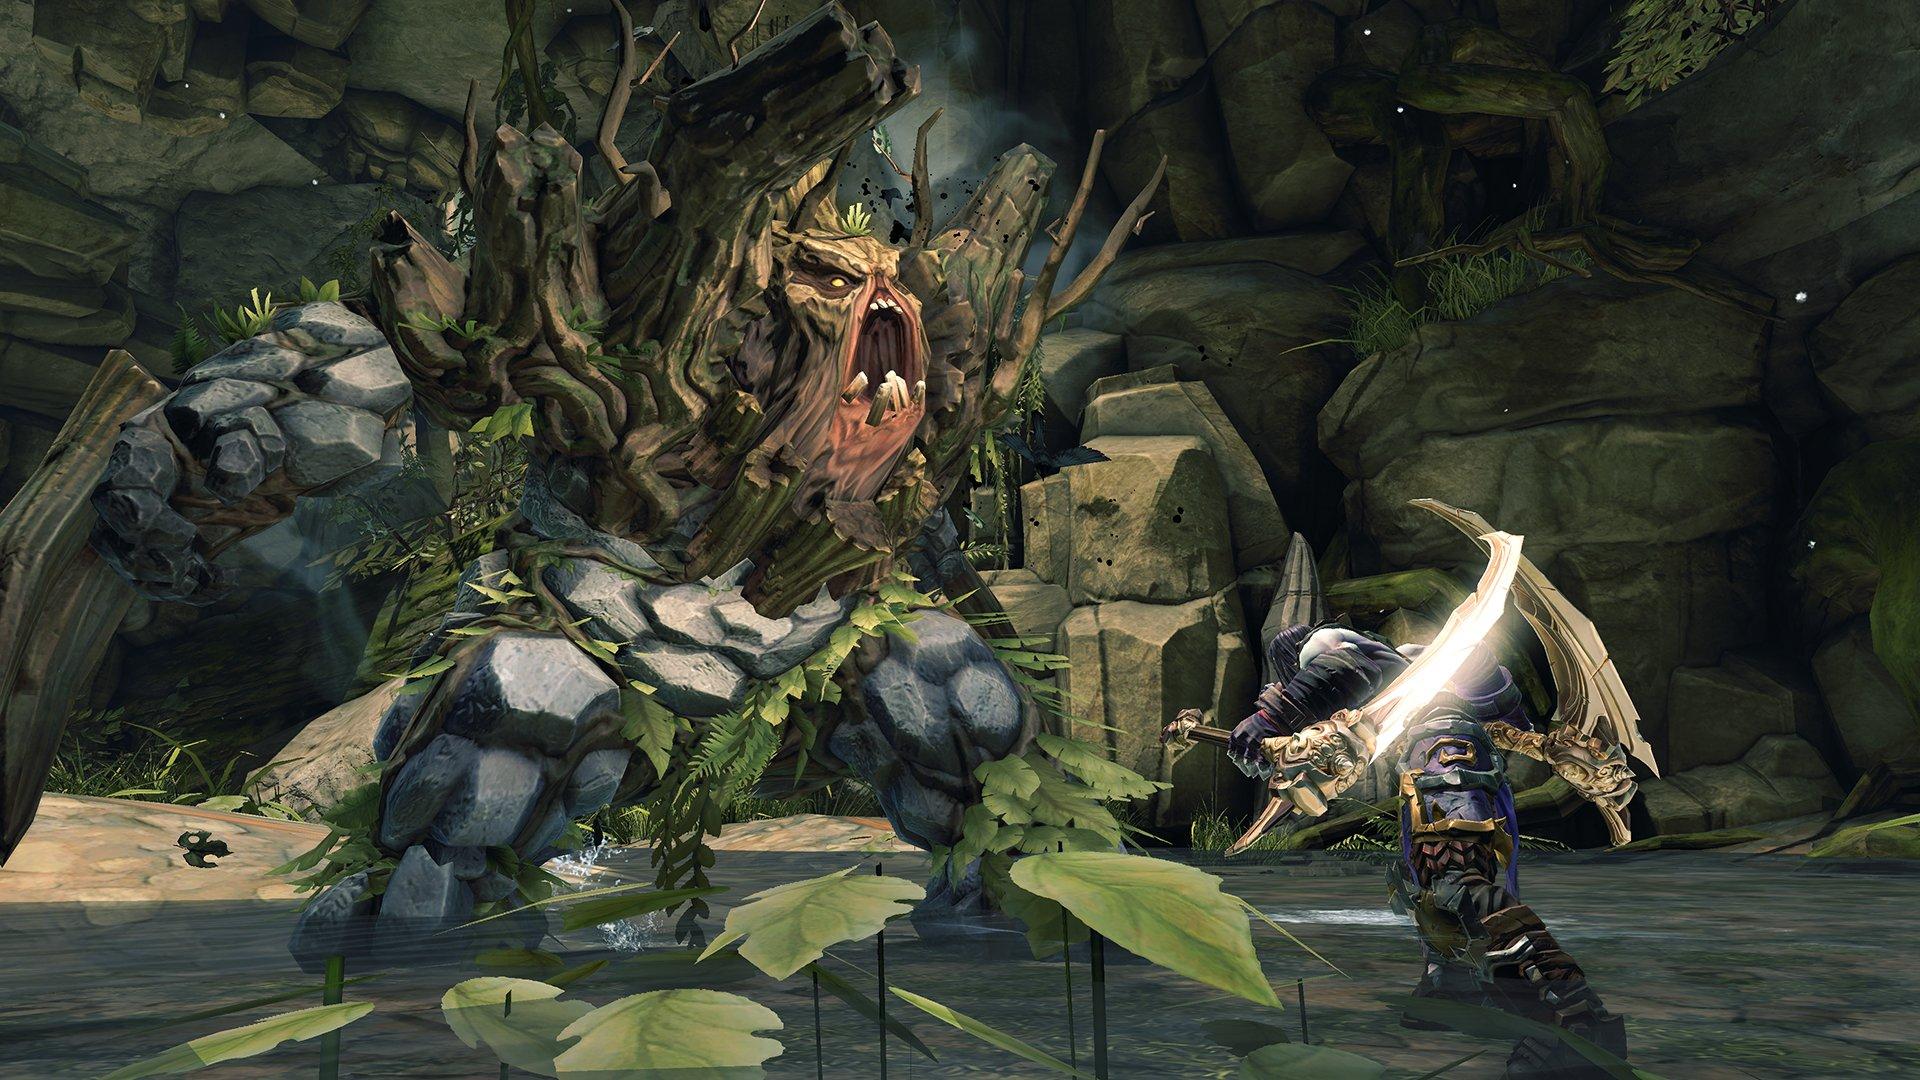 Amazon com: Darksiders 2: Deathinitive Edition - PlayStation